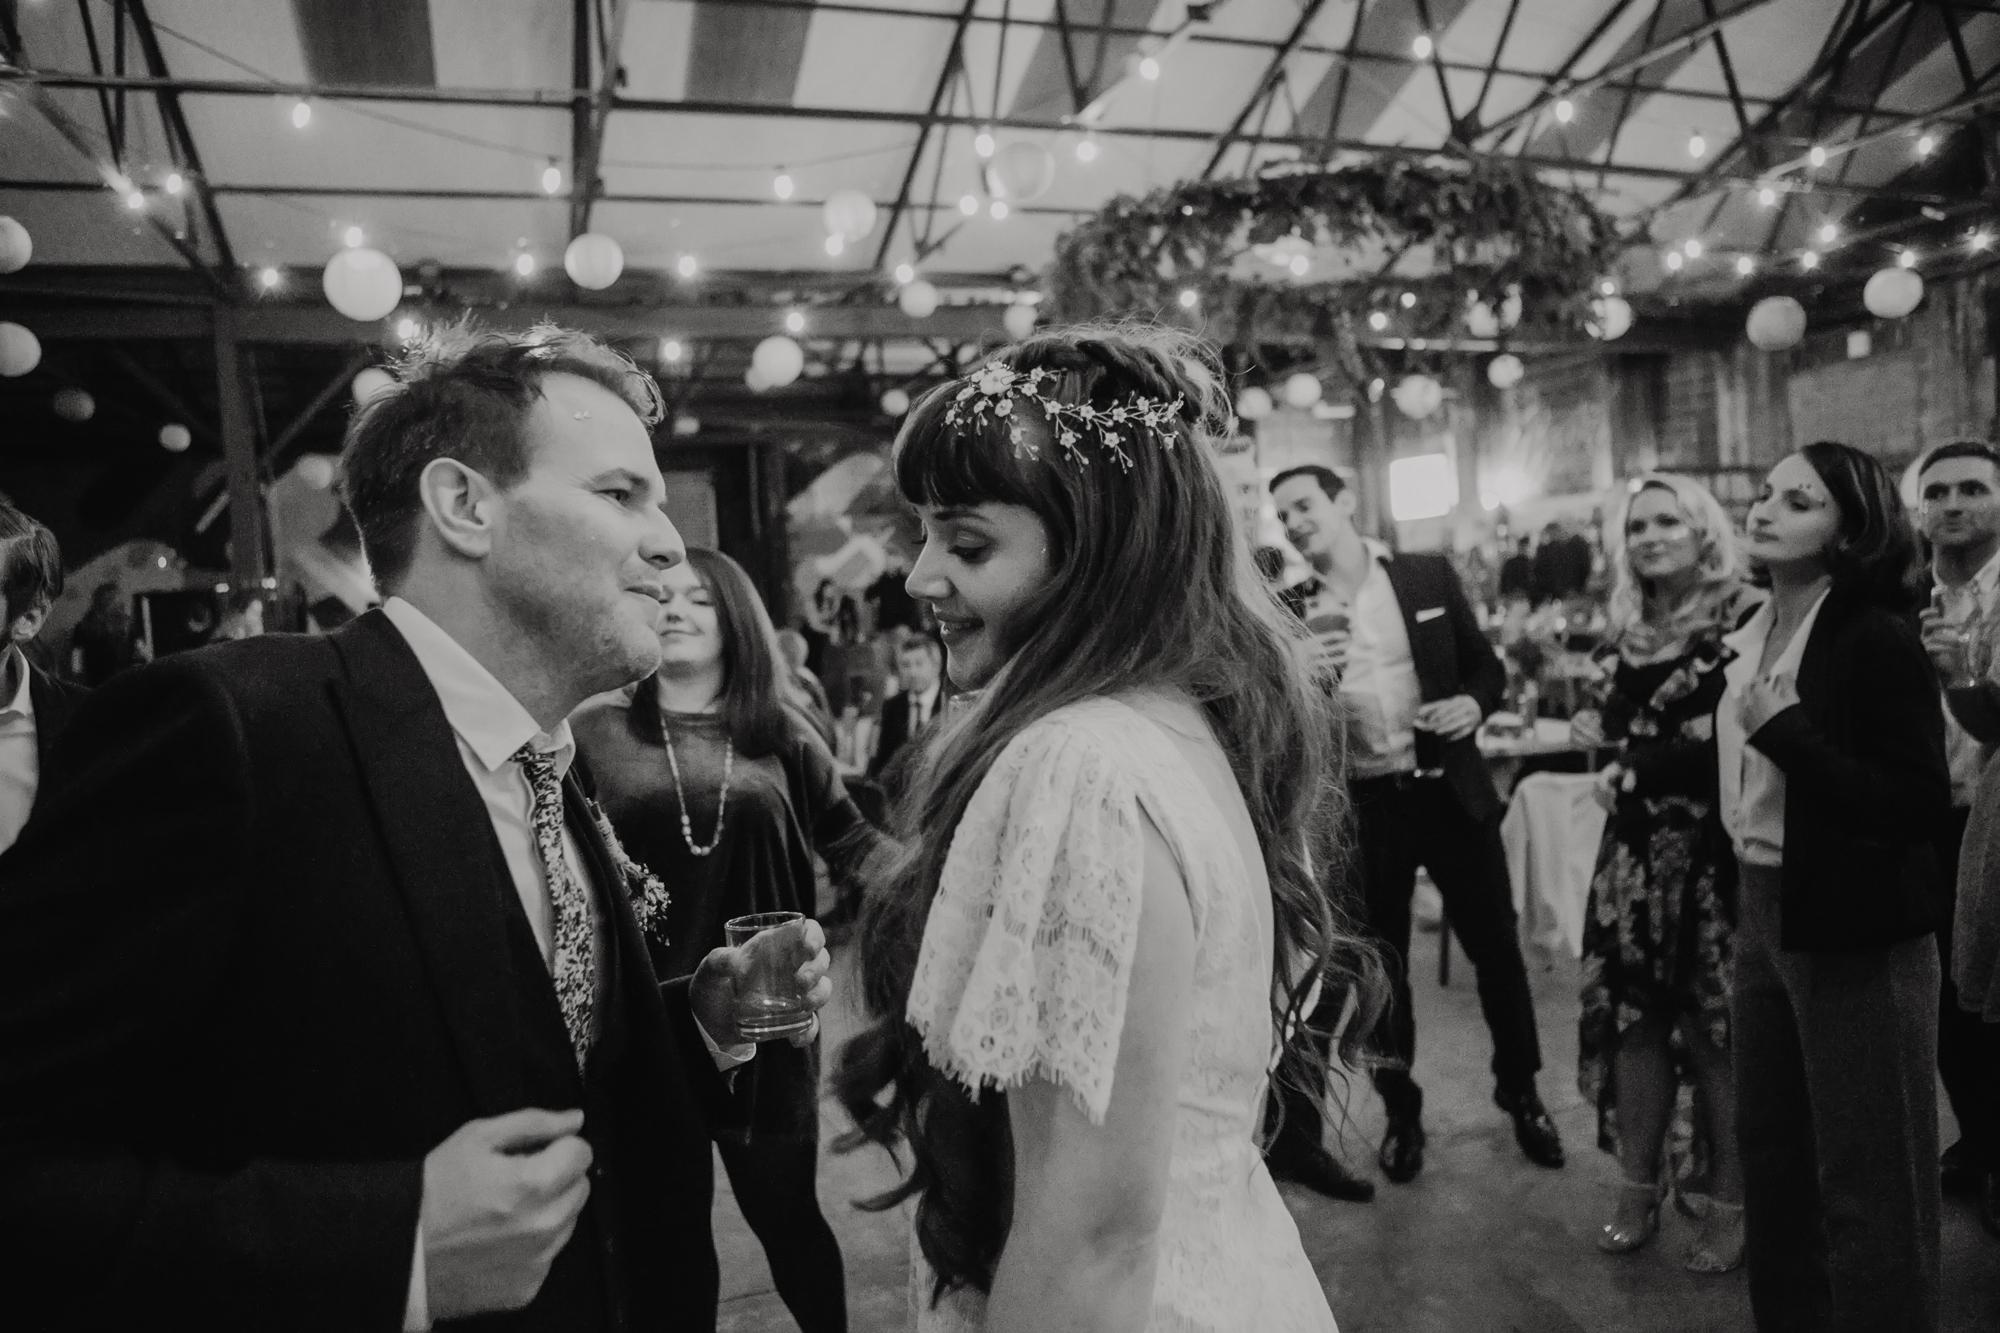 Kristy-Back-Garden-Outdoor-Wedding-Sheffield-Industrial-Warehouse-Wedding-Bohemian-Kate-Beaumont-Dahlia-Dress-59.jpg